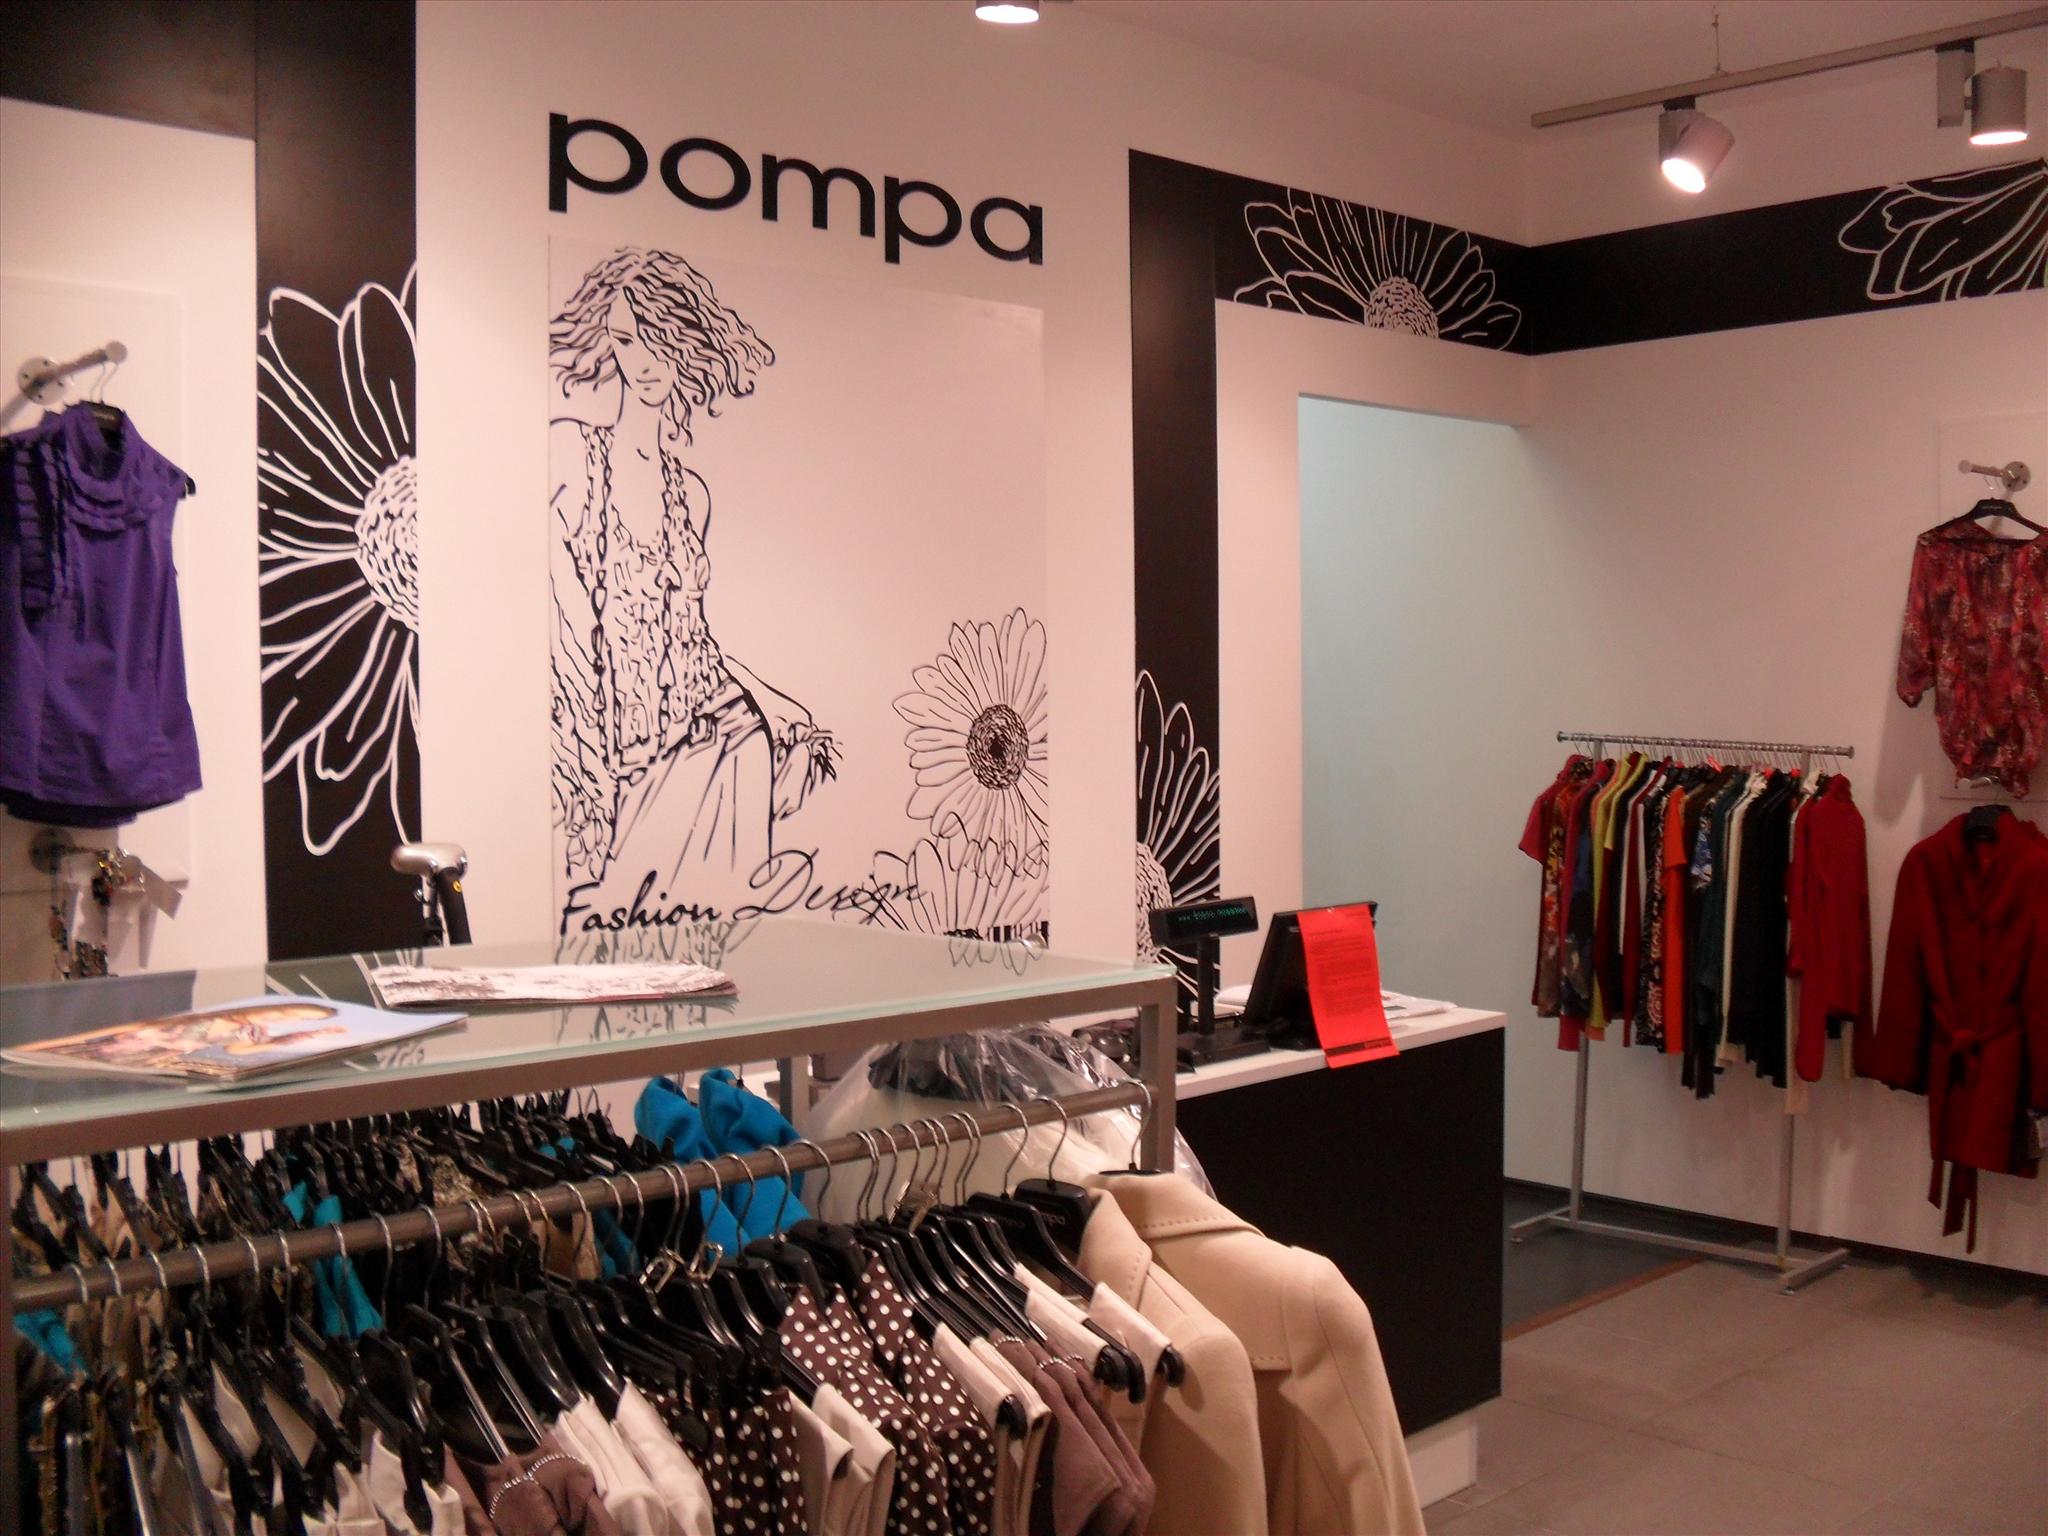 Pompa Женская Одежда